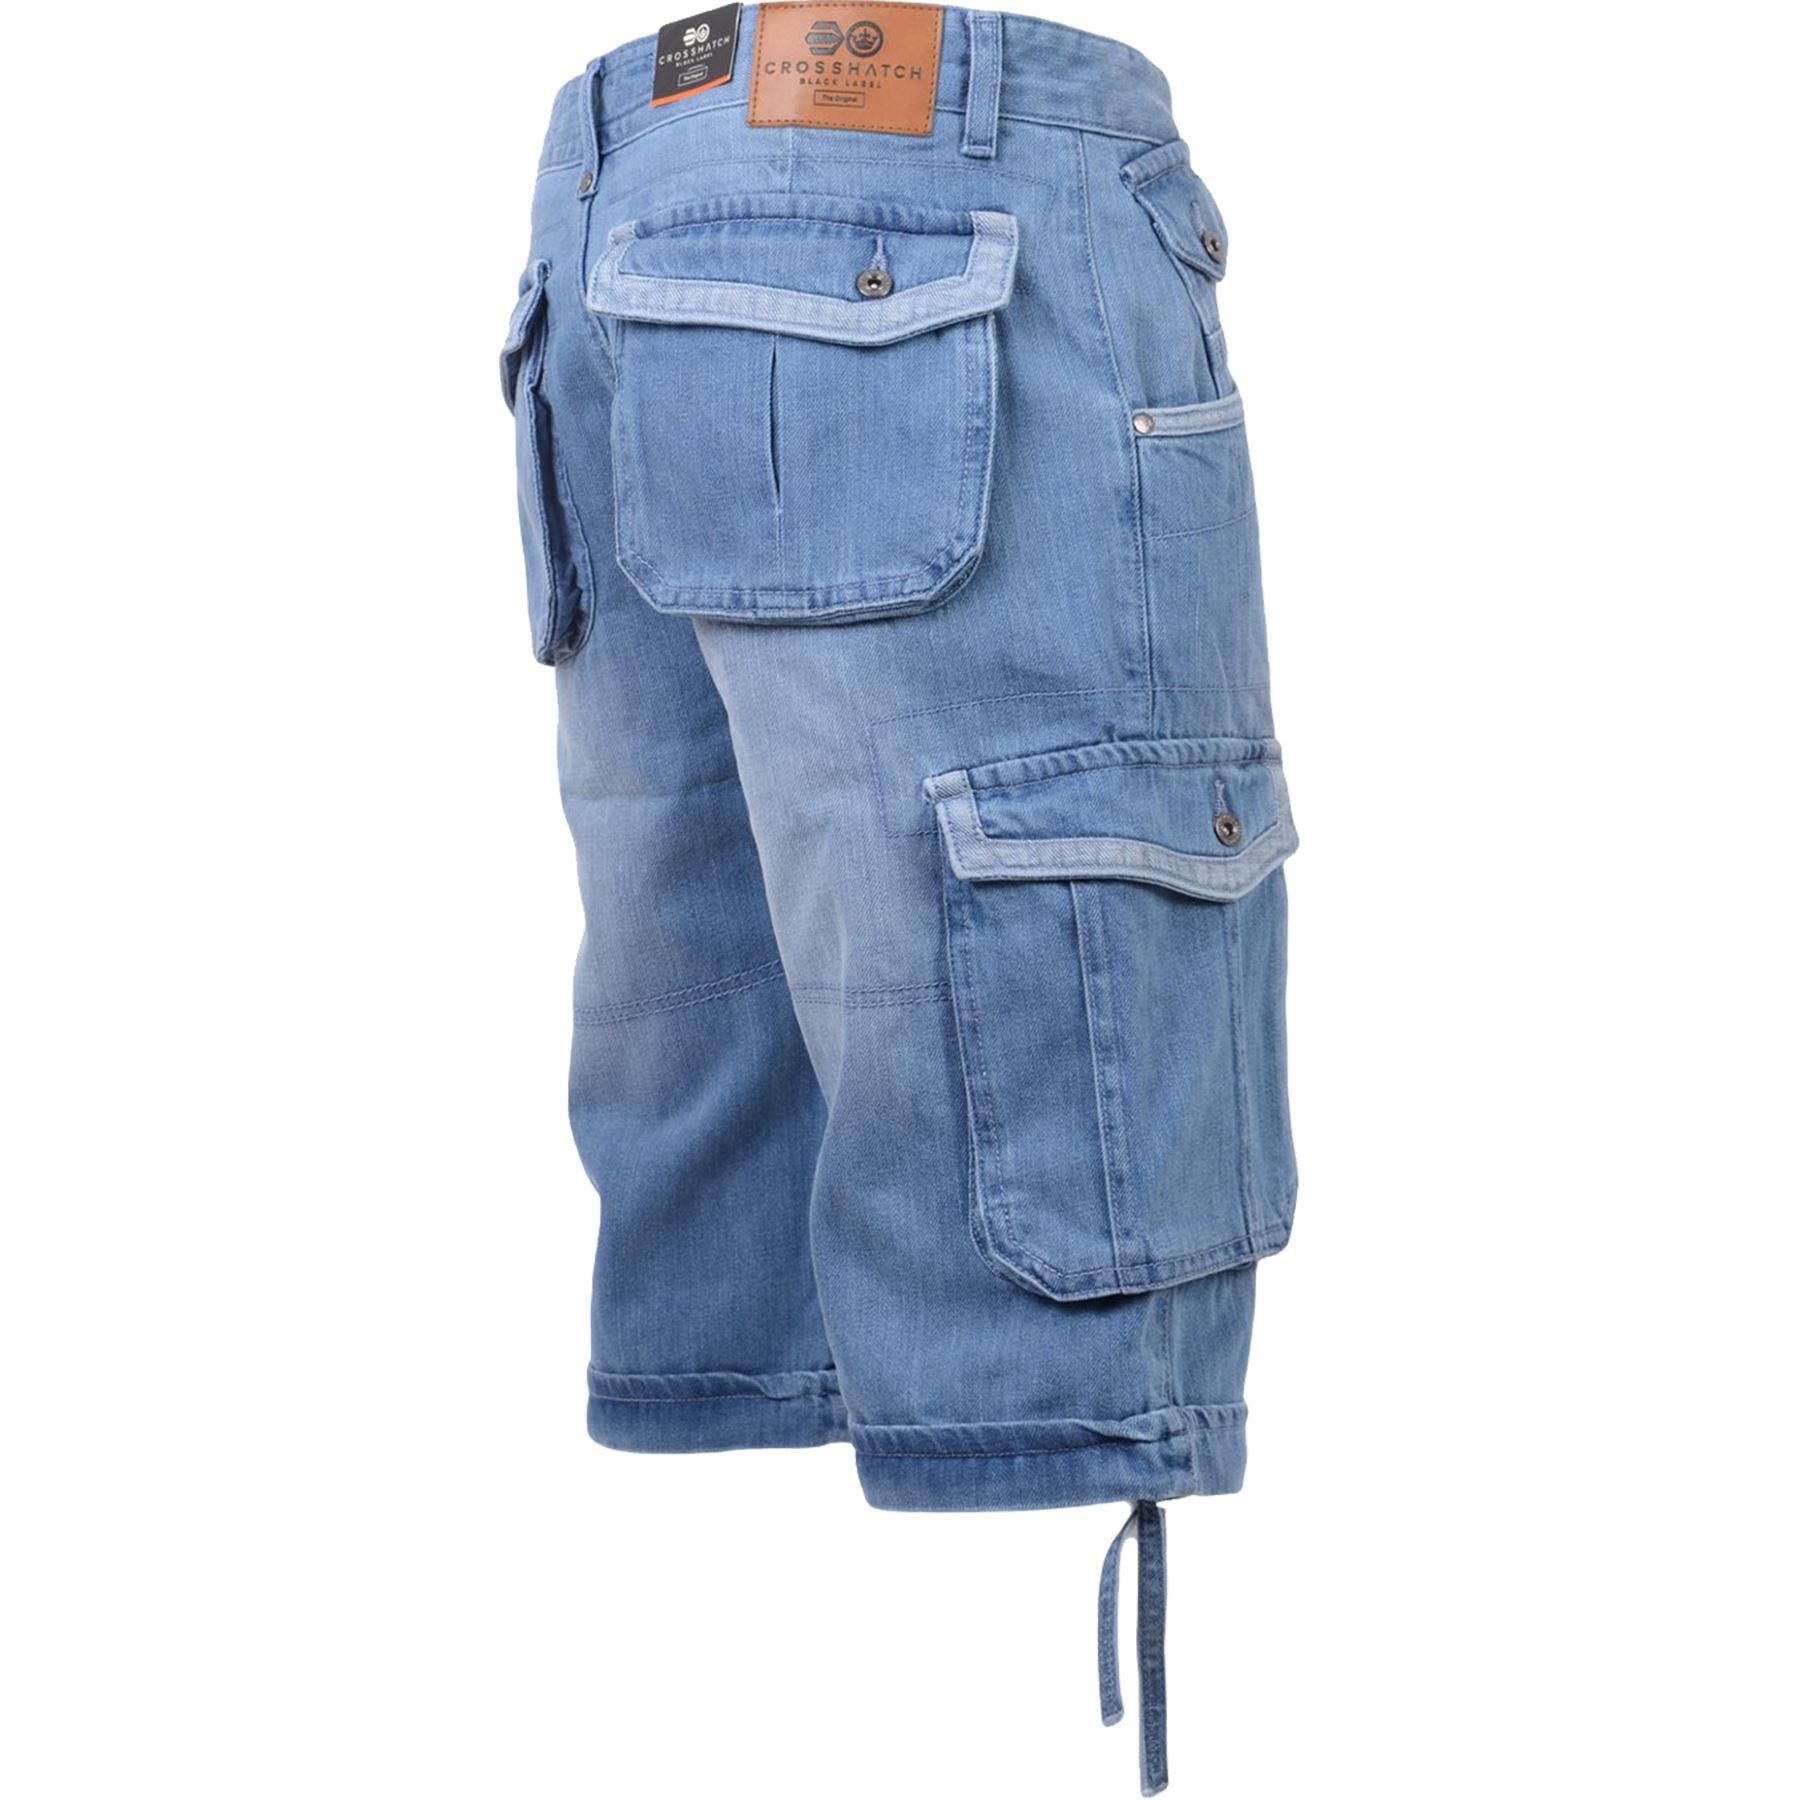 New-Mens-Crosshatch-Canvas-Cargo-Denim-Camo-Shorts-Chino-2019-Styles-30-42-034 thumbnail 31